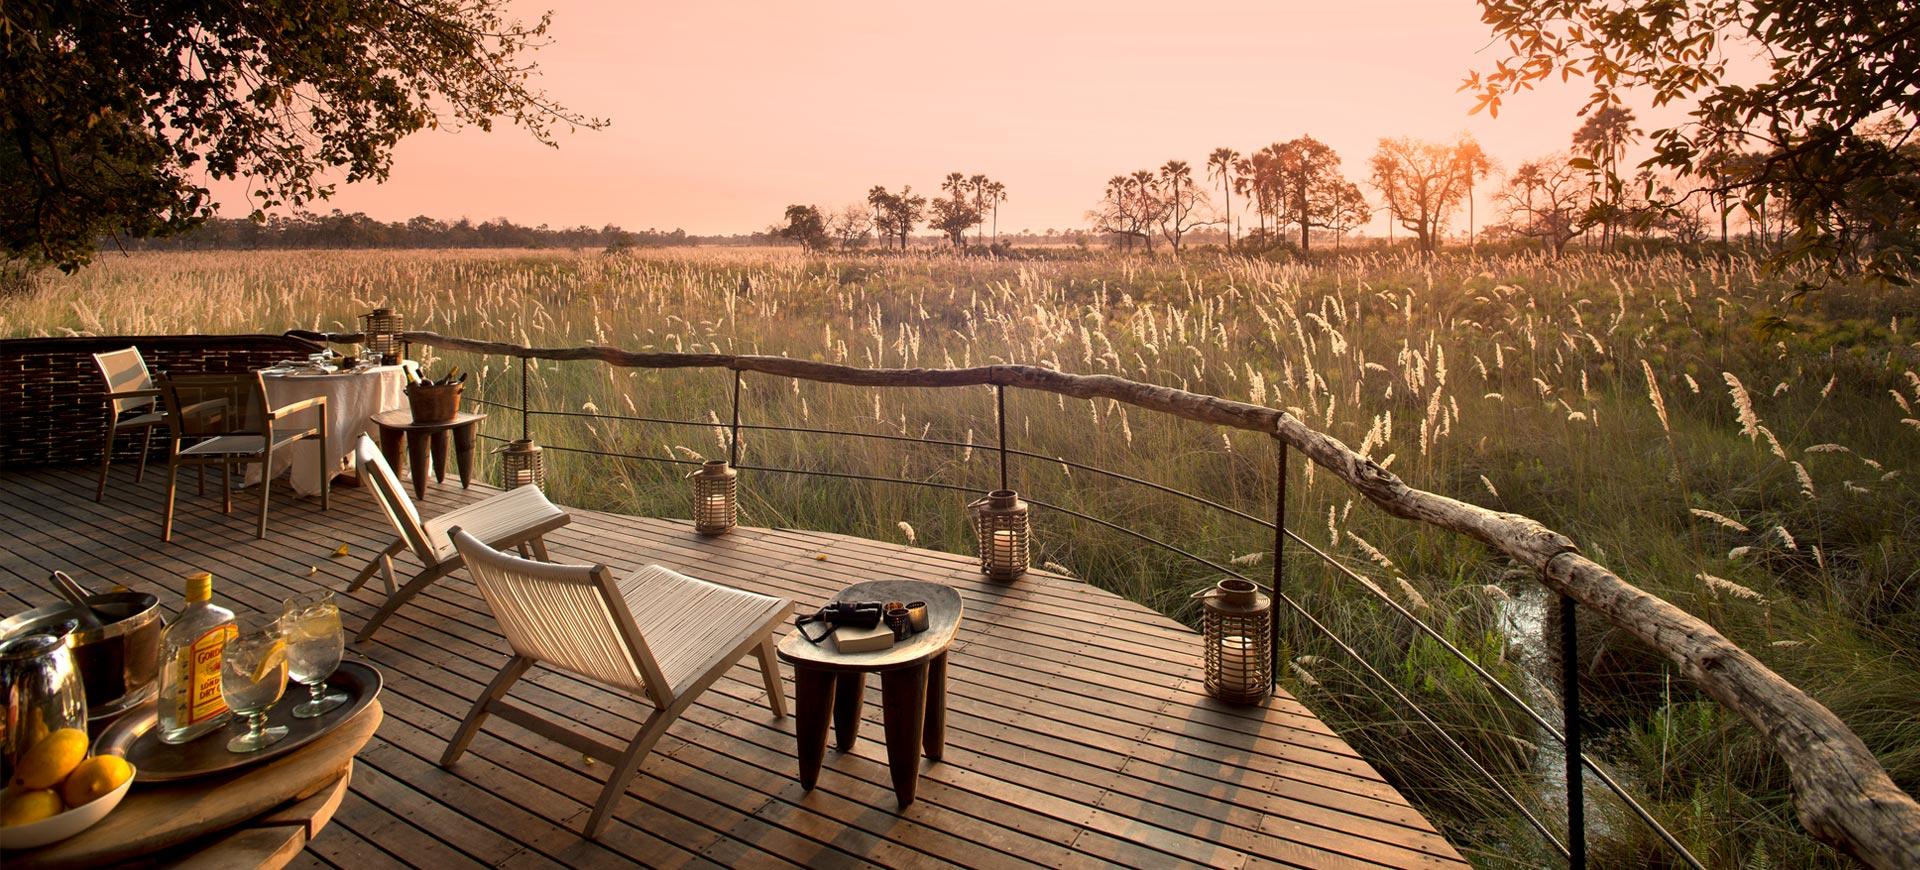 Sandibe Safari Lodge Okavango